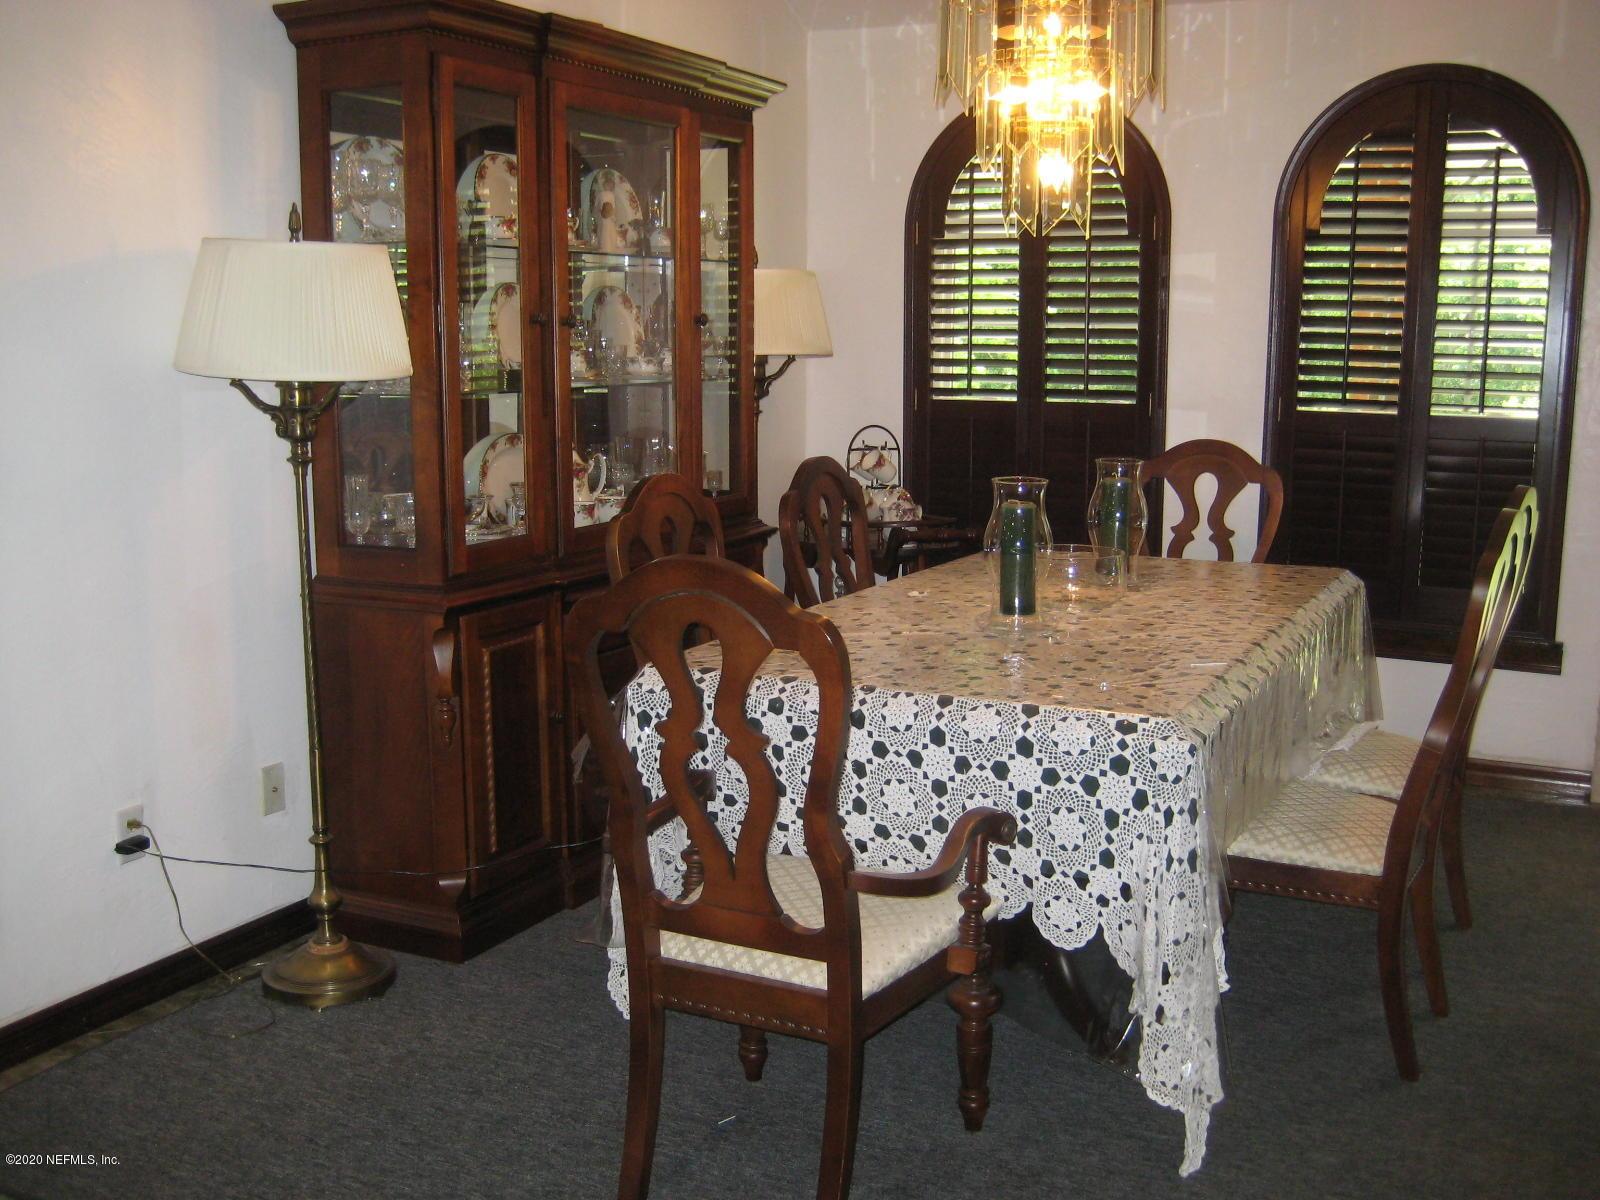 2814 PERIWINKLE, MIDDLEBURG, FLORIDA 32068, 3 Bedrooms Bedrooms, ,2 BathroomsBathrooms,Residential,For sale,PERIWINKLE,1066168